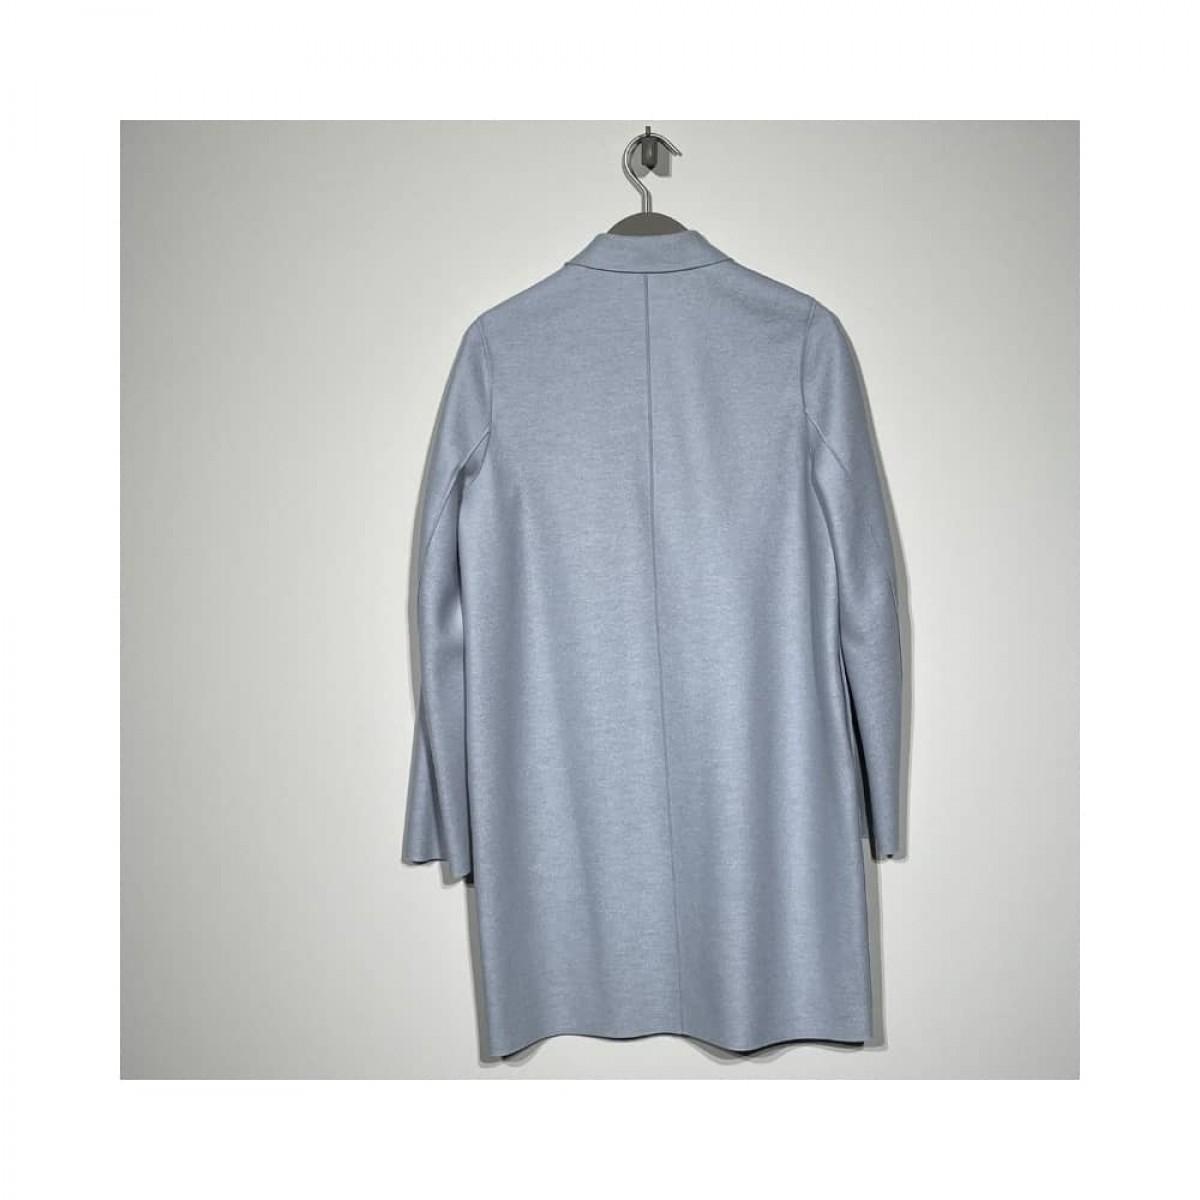 coccon coat - light blue - bag